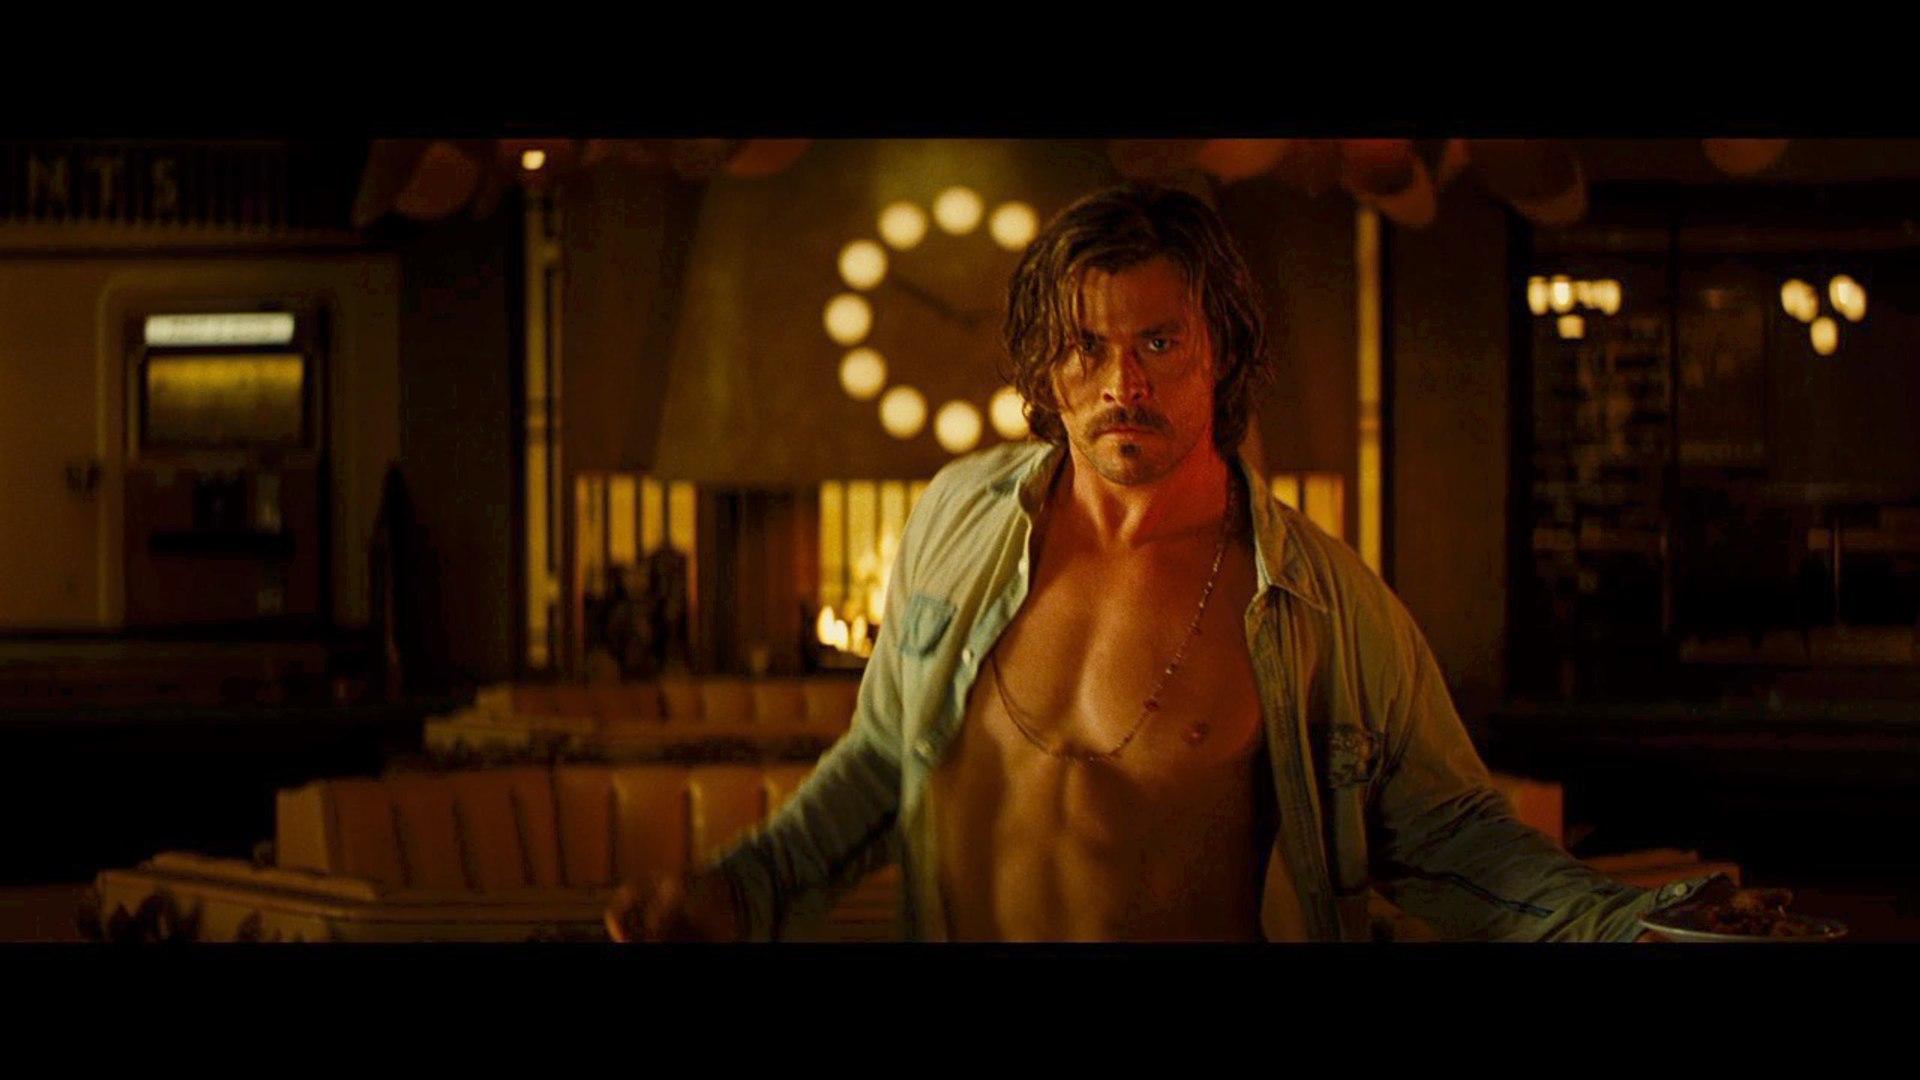 Chris Hemsworth Dakota Johnson In Bad Times At The El Royale